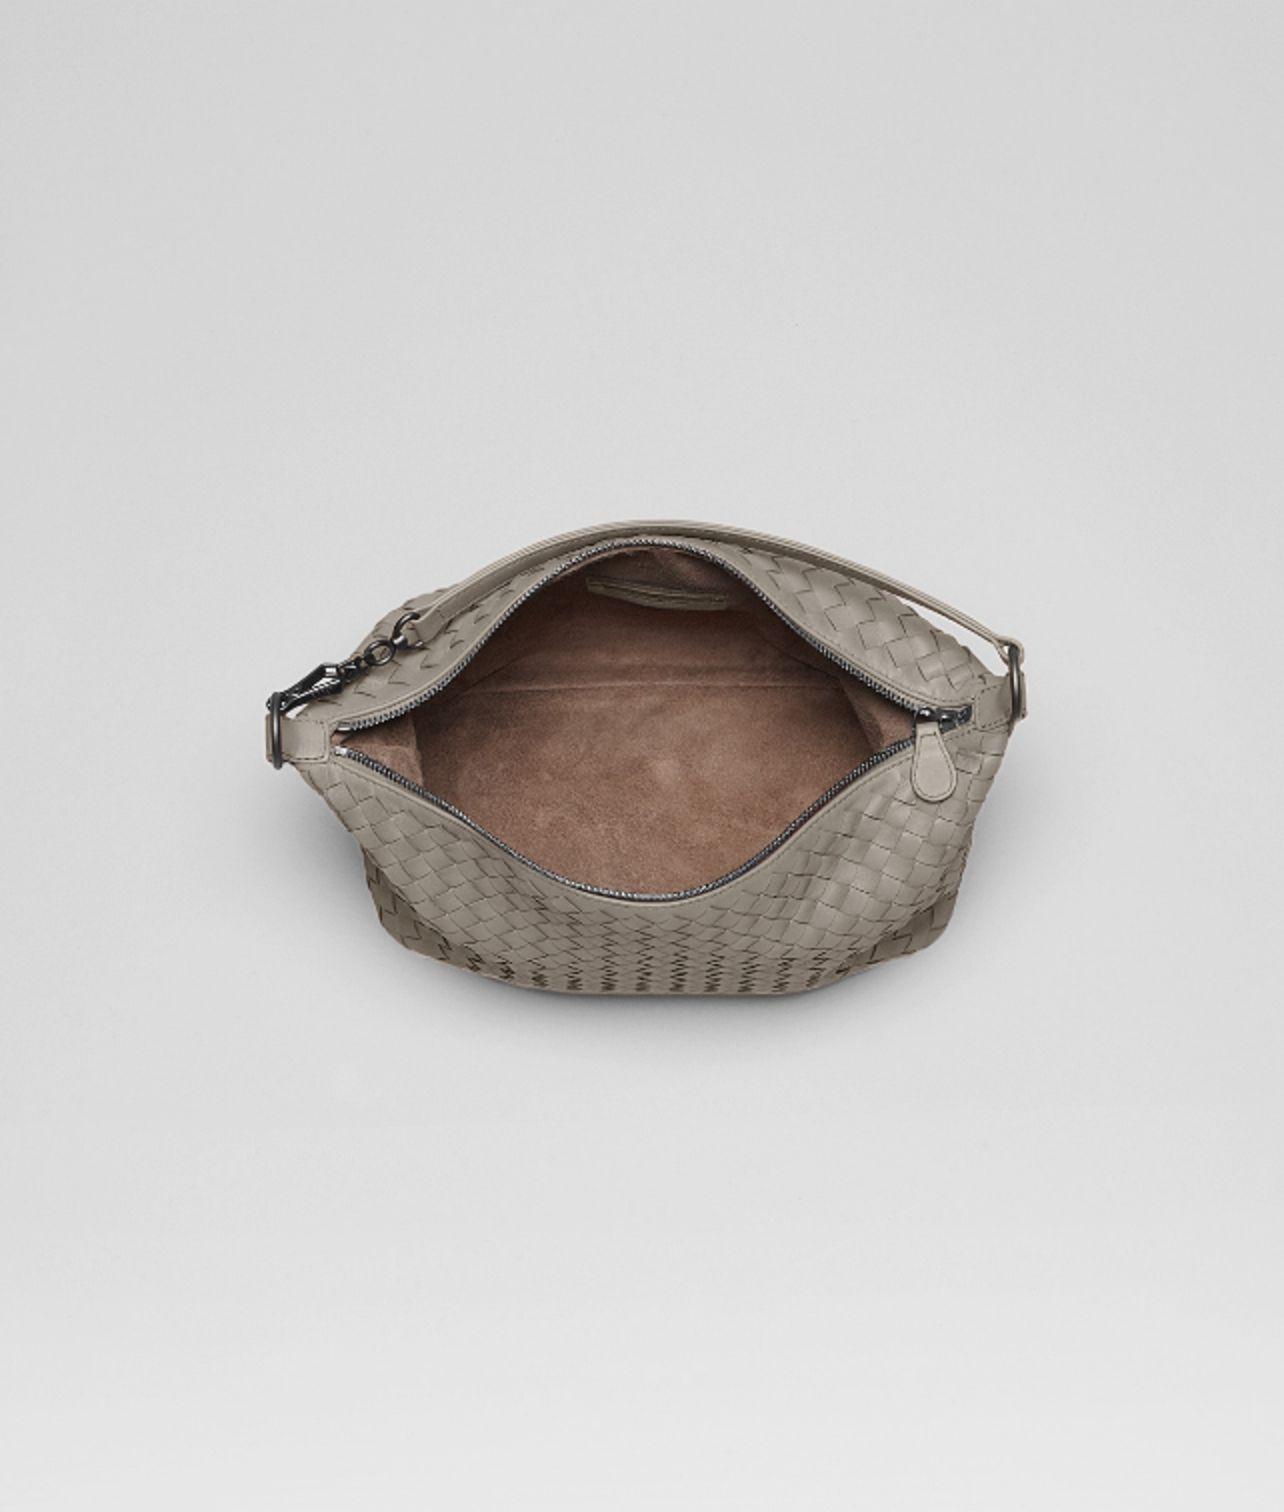 0878c87a135 Bottega Veneta Fume Intrecciato Nappa Bag in Gray - Lyst